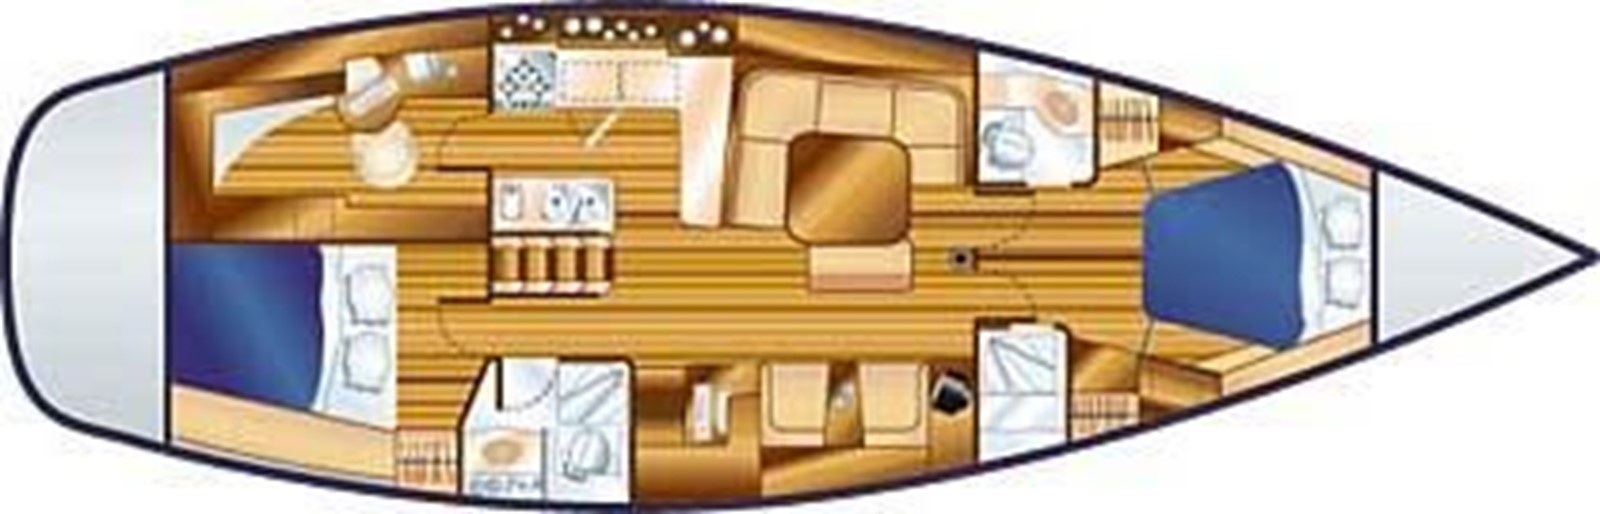 2004 HUNTER 466 Cruising Sailboat 2574036